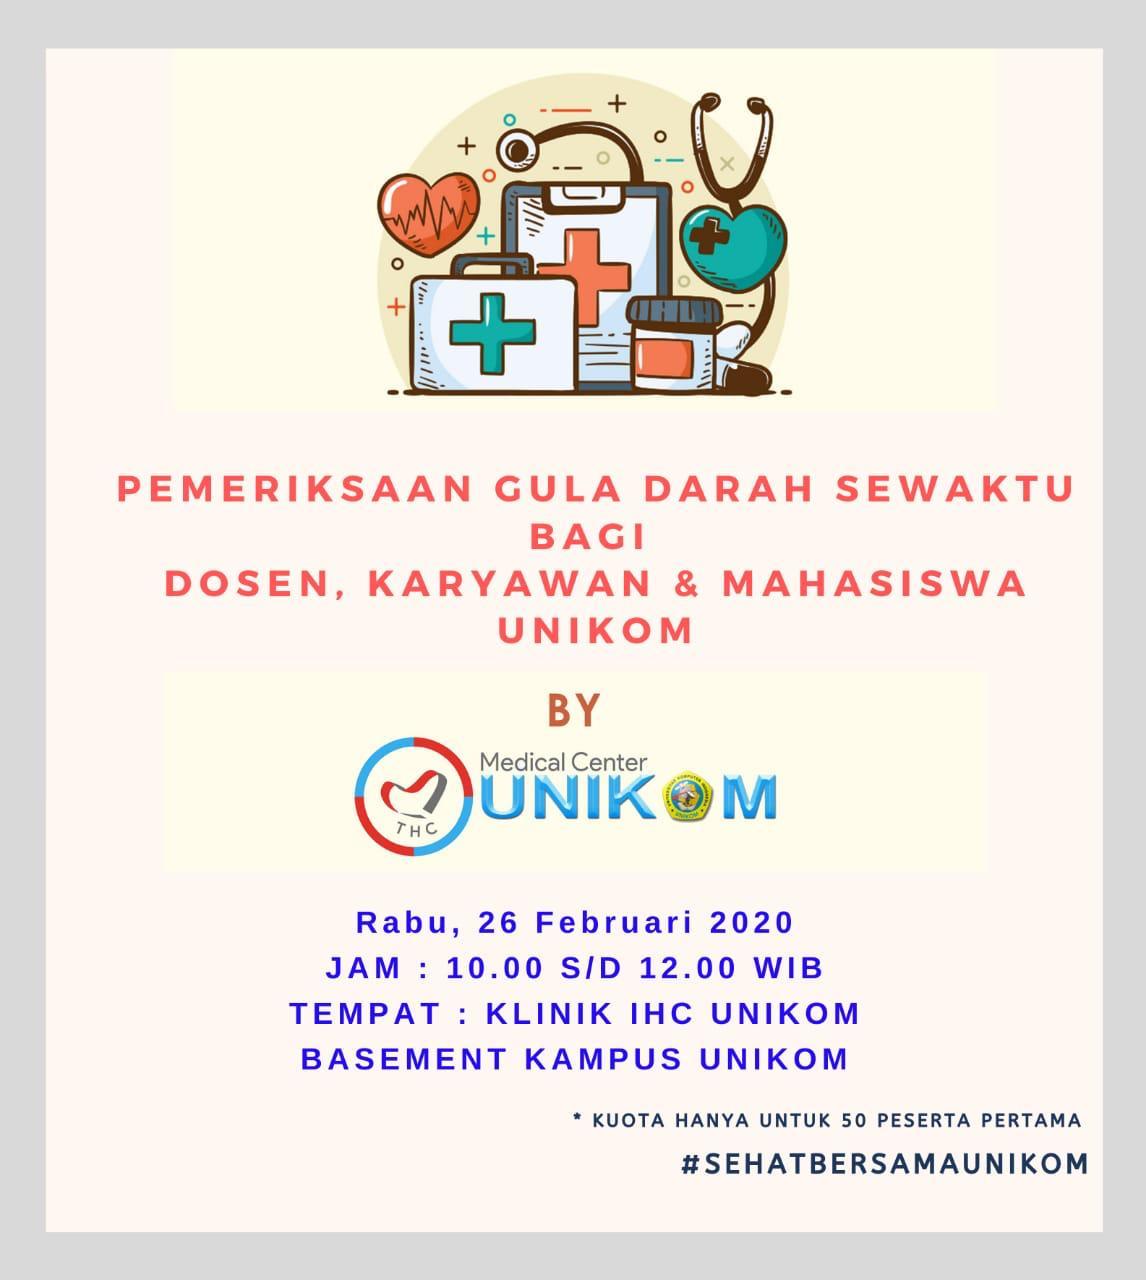 Medical Center Unikom : Pemeriksaan Gula Darah